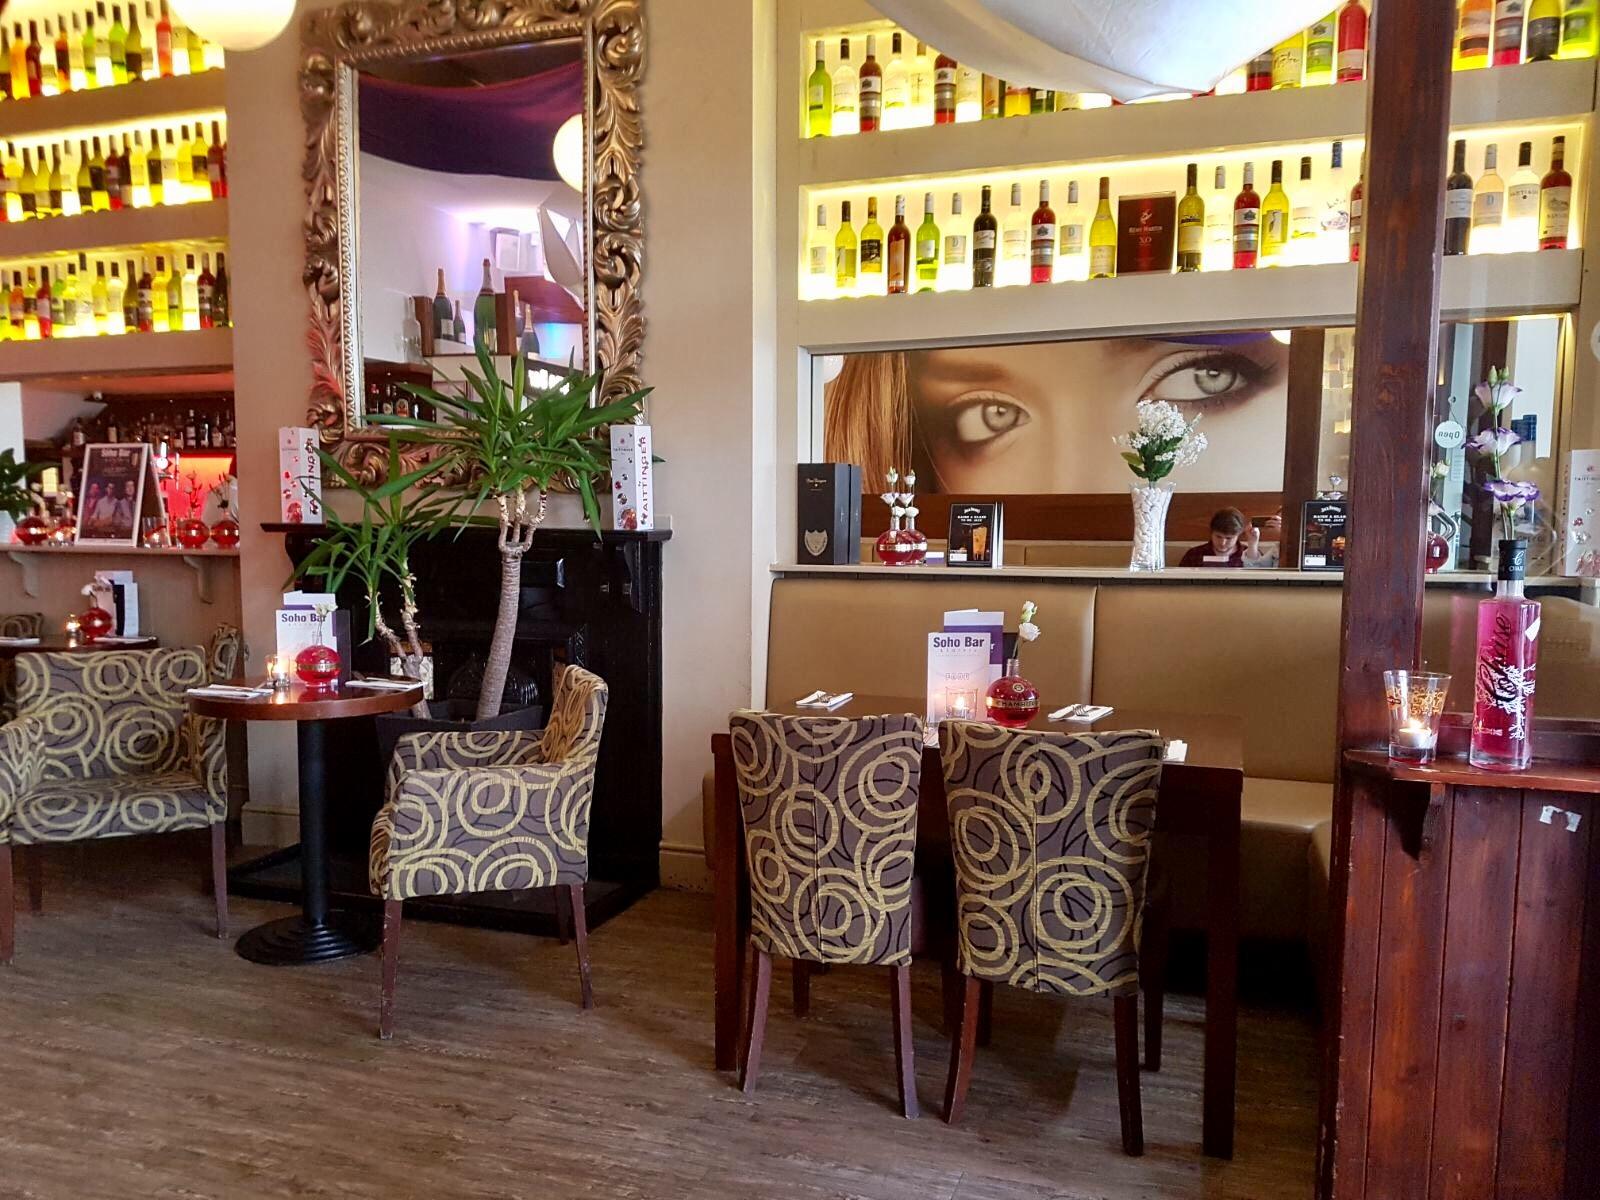 Soho bar cheltenham